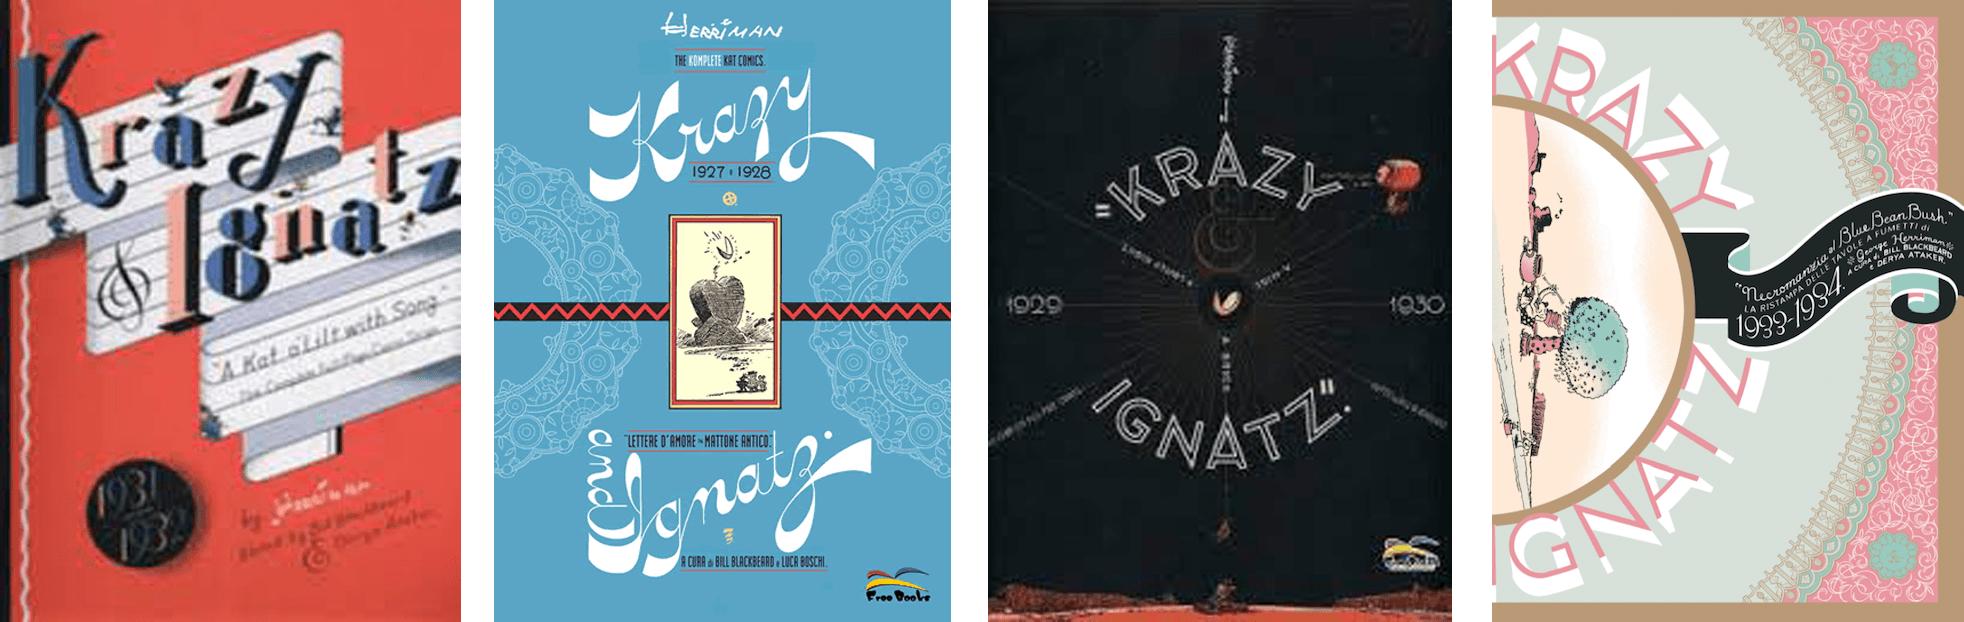 300-krazy-kat-varie-pubblicazioni_300: biblioteca essenziale del fumetto